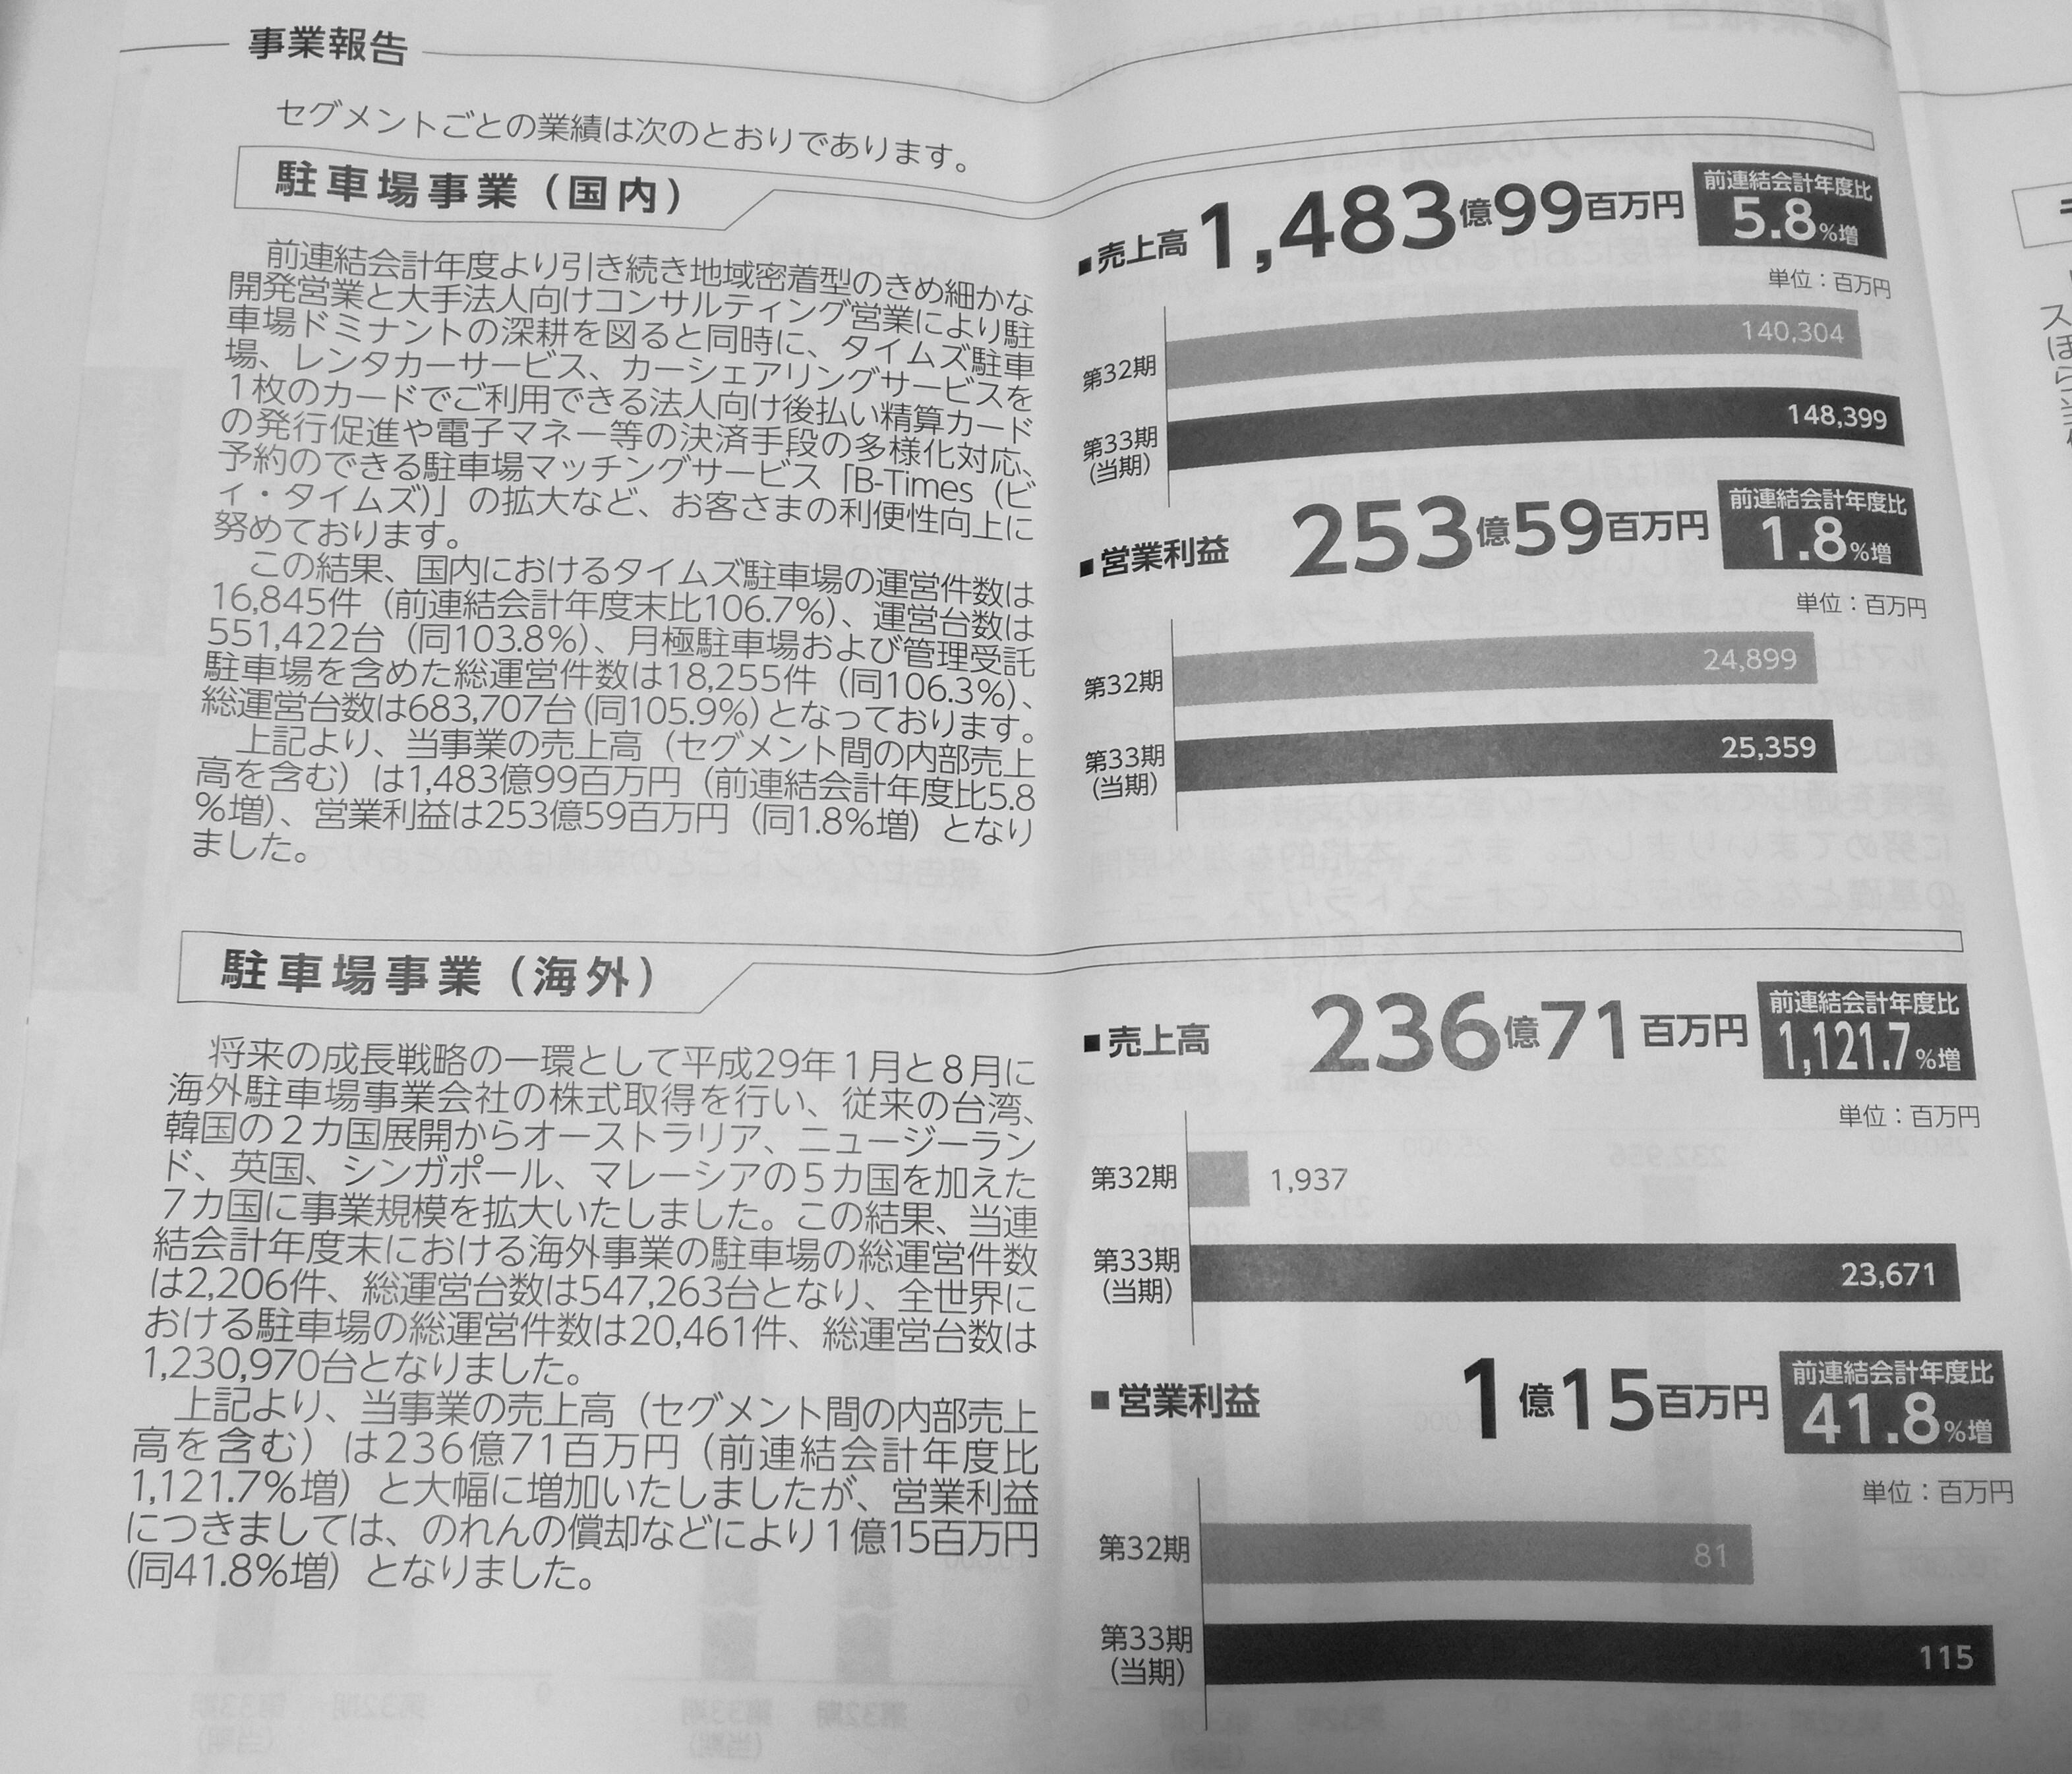 f:id:hiro_116:20180105075100j:image